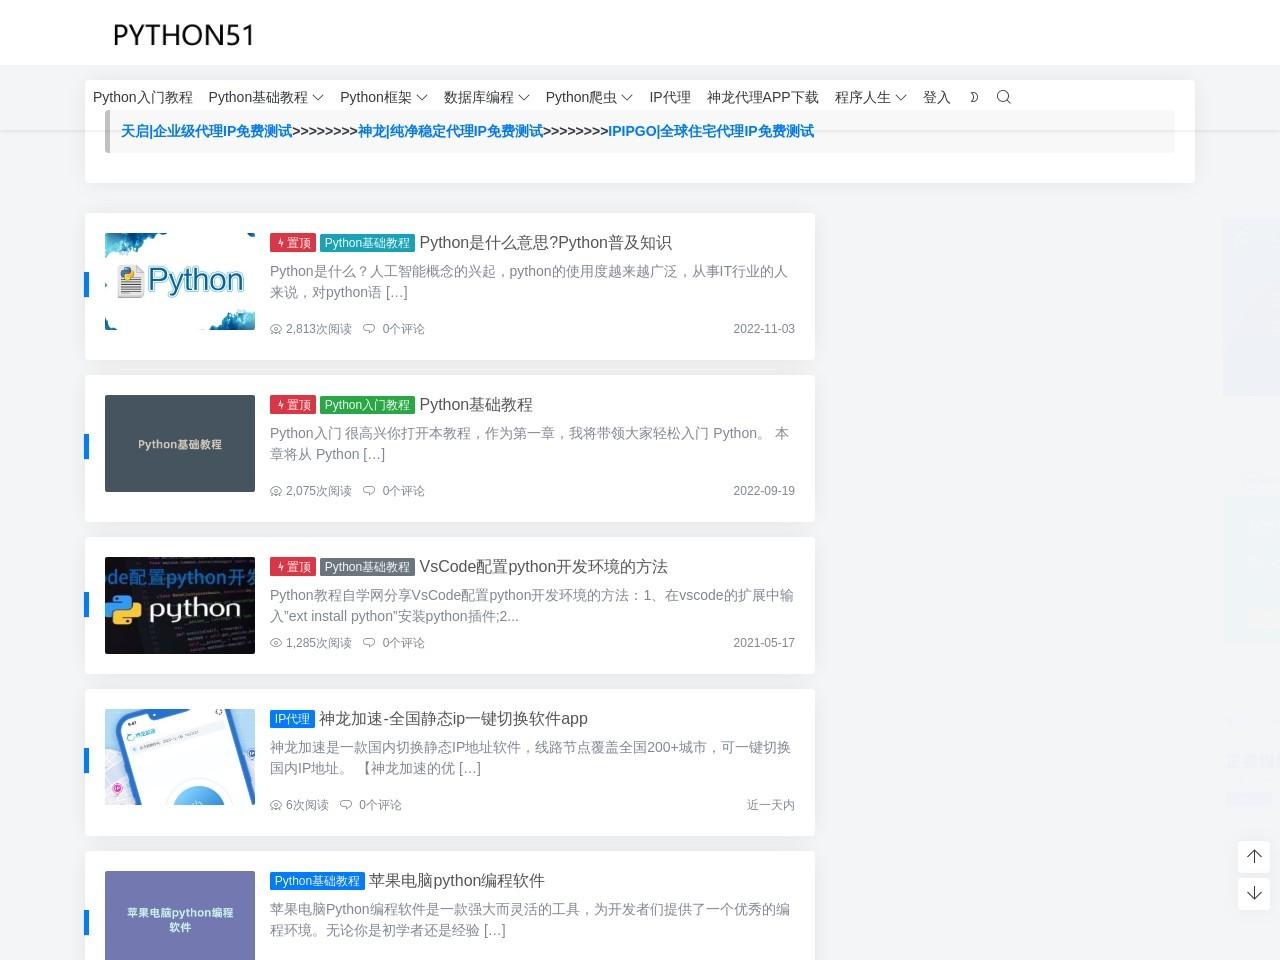 Python教程自学网-Python培训,Python编程培训学习网站